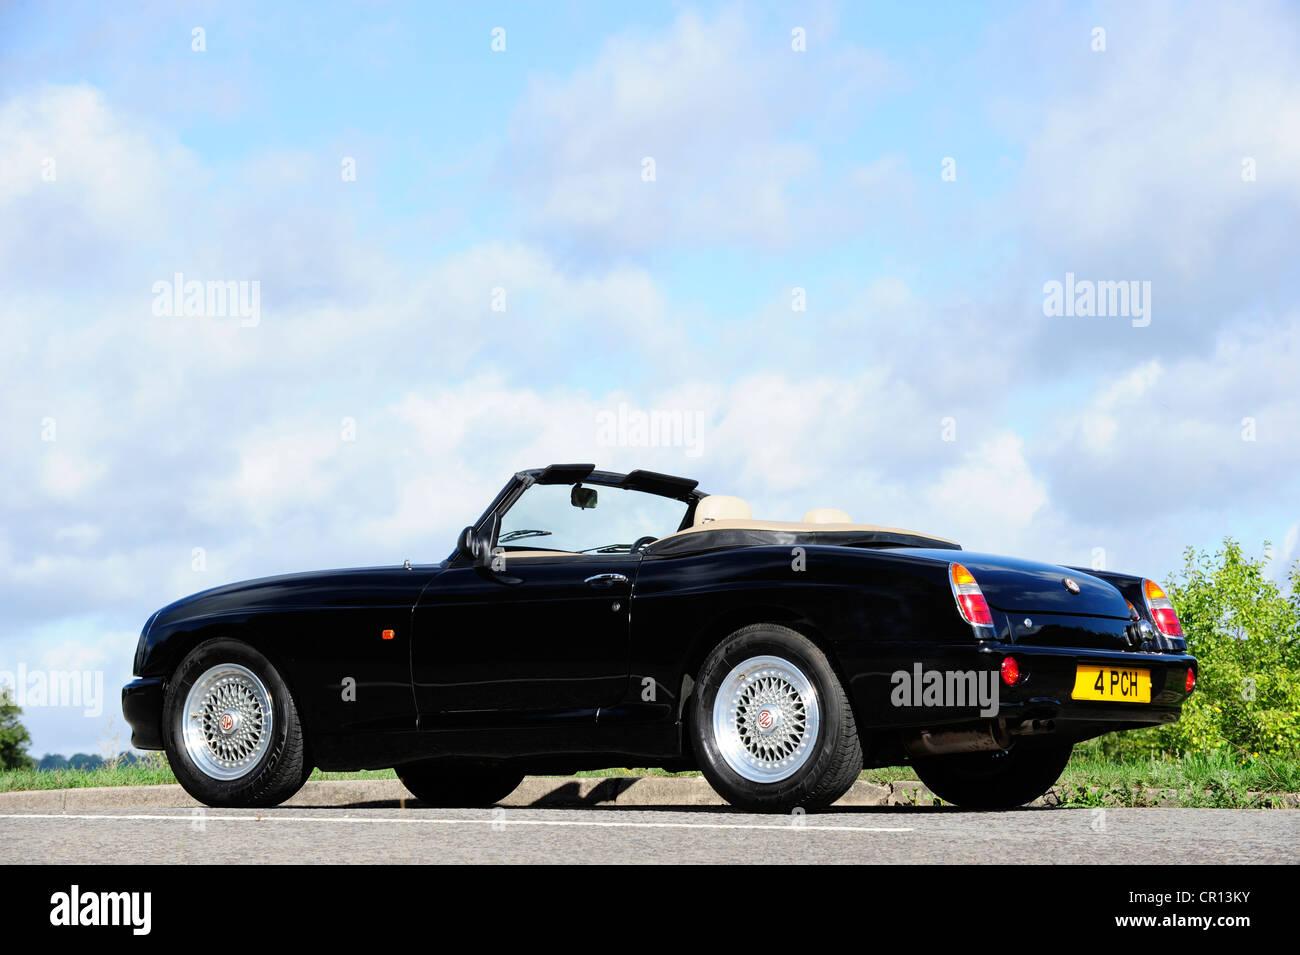 1996 MG RV8 Roadster British sports car - Stock Image